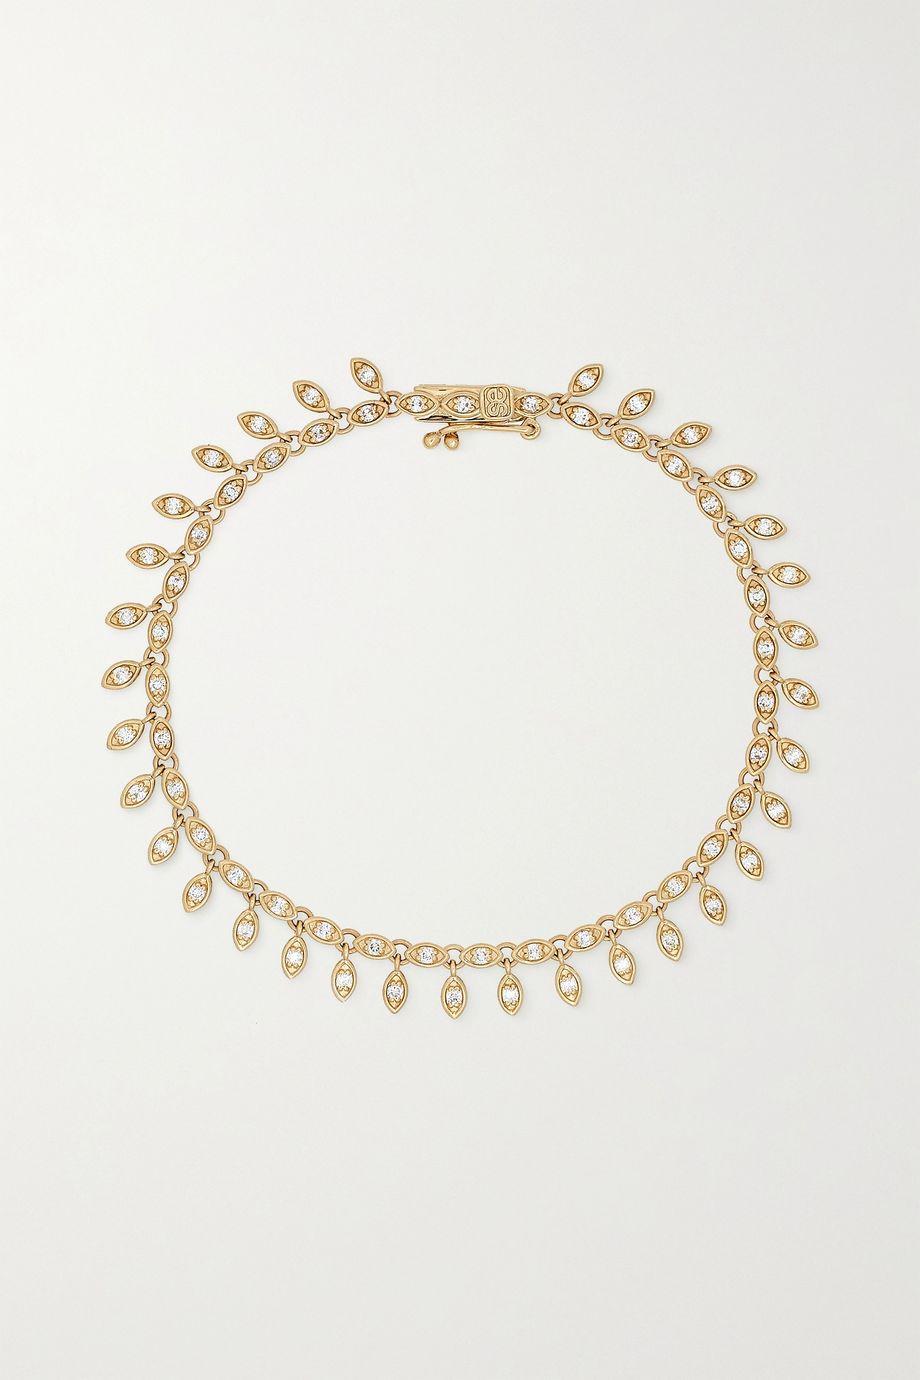 Sydney Evan Evil Eye Eternity 14-karat gold diamond bracelet